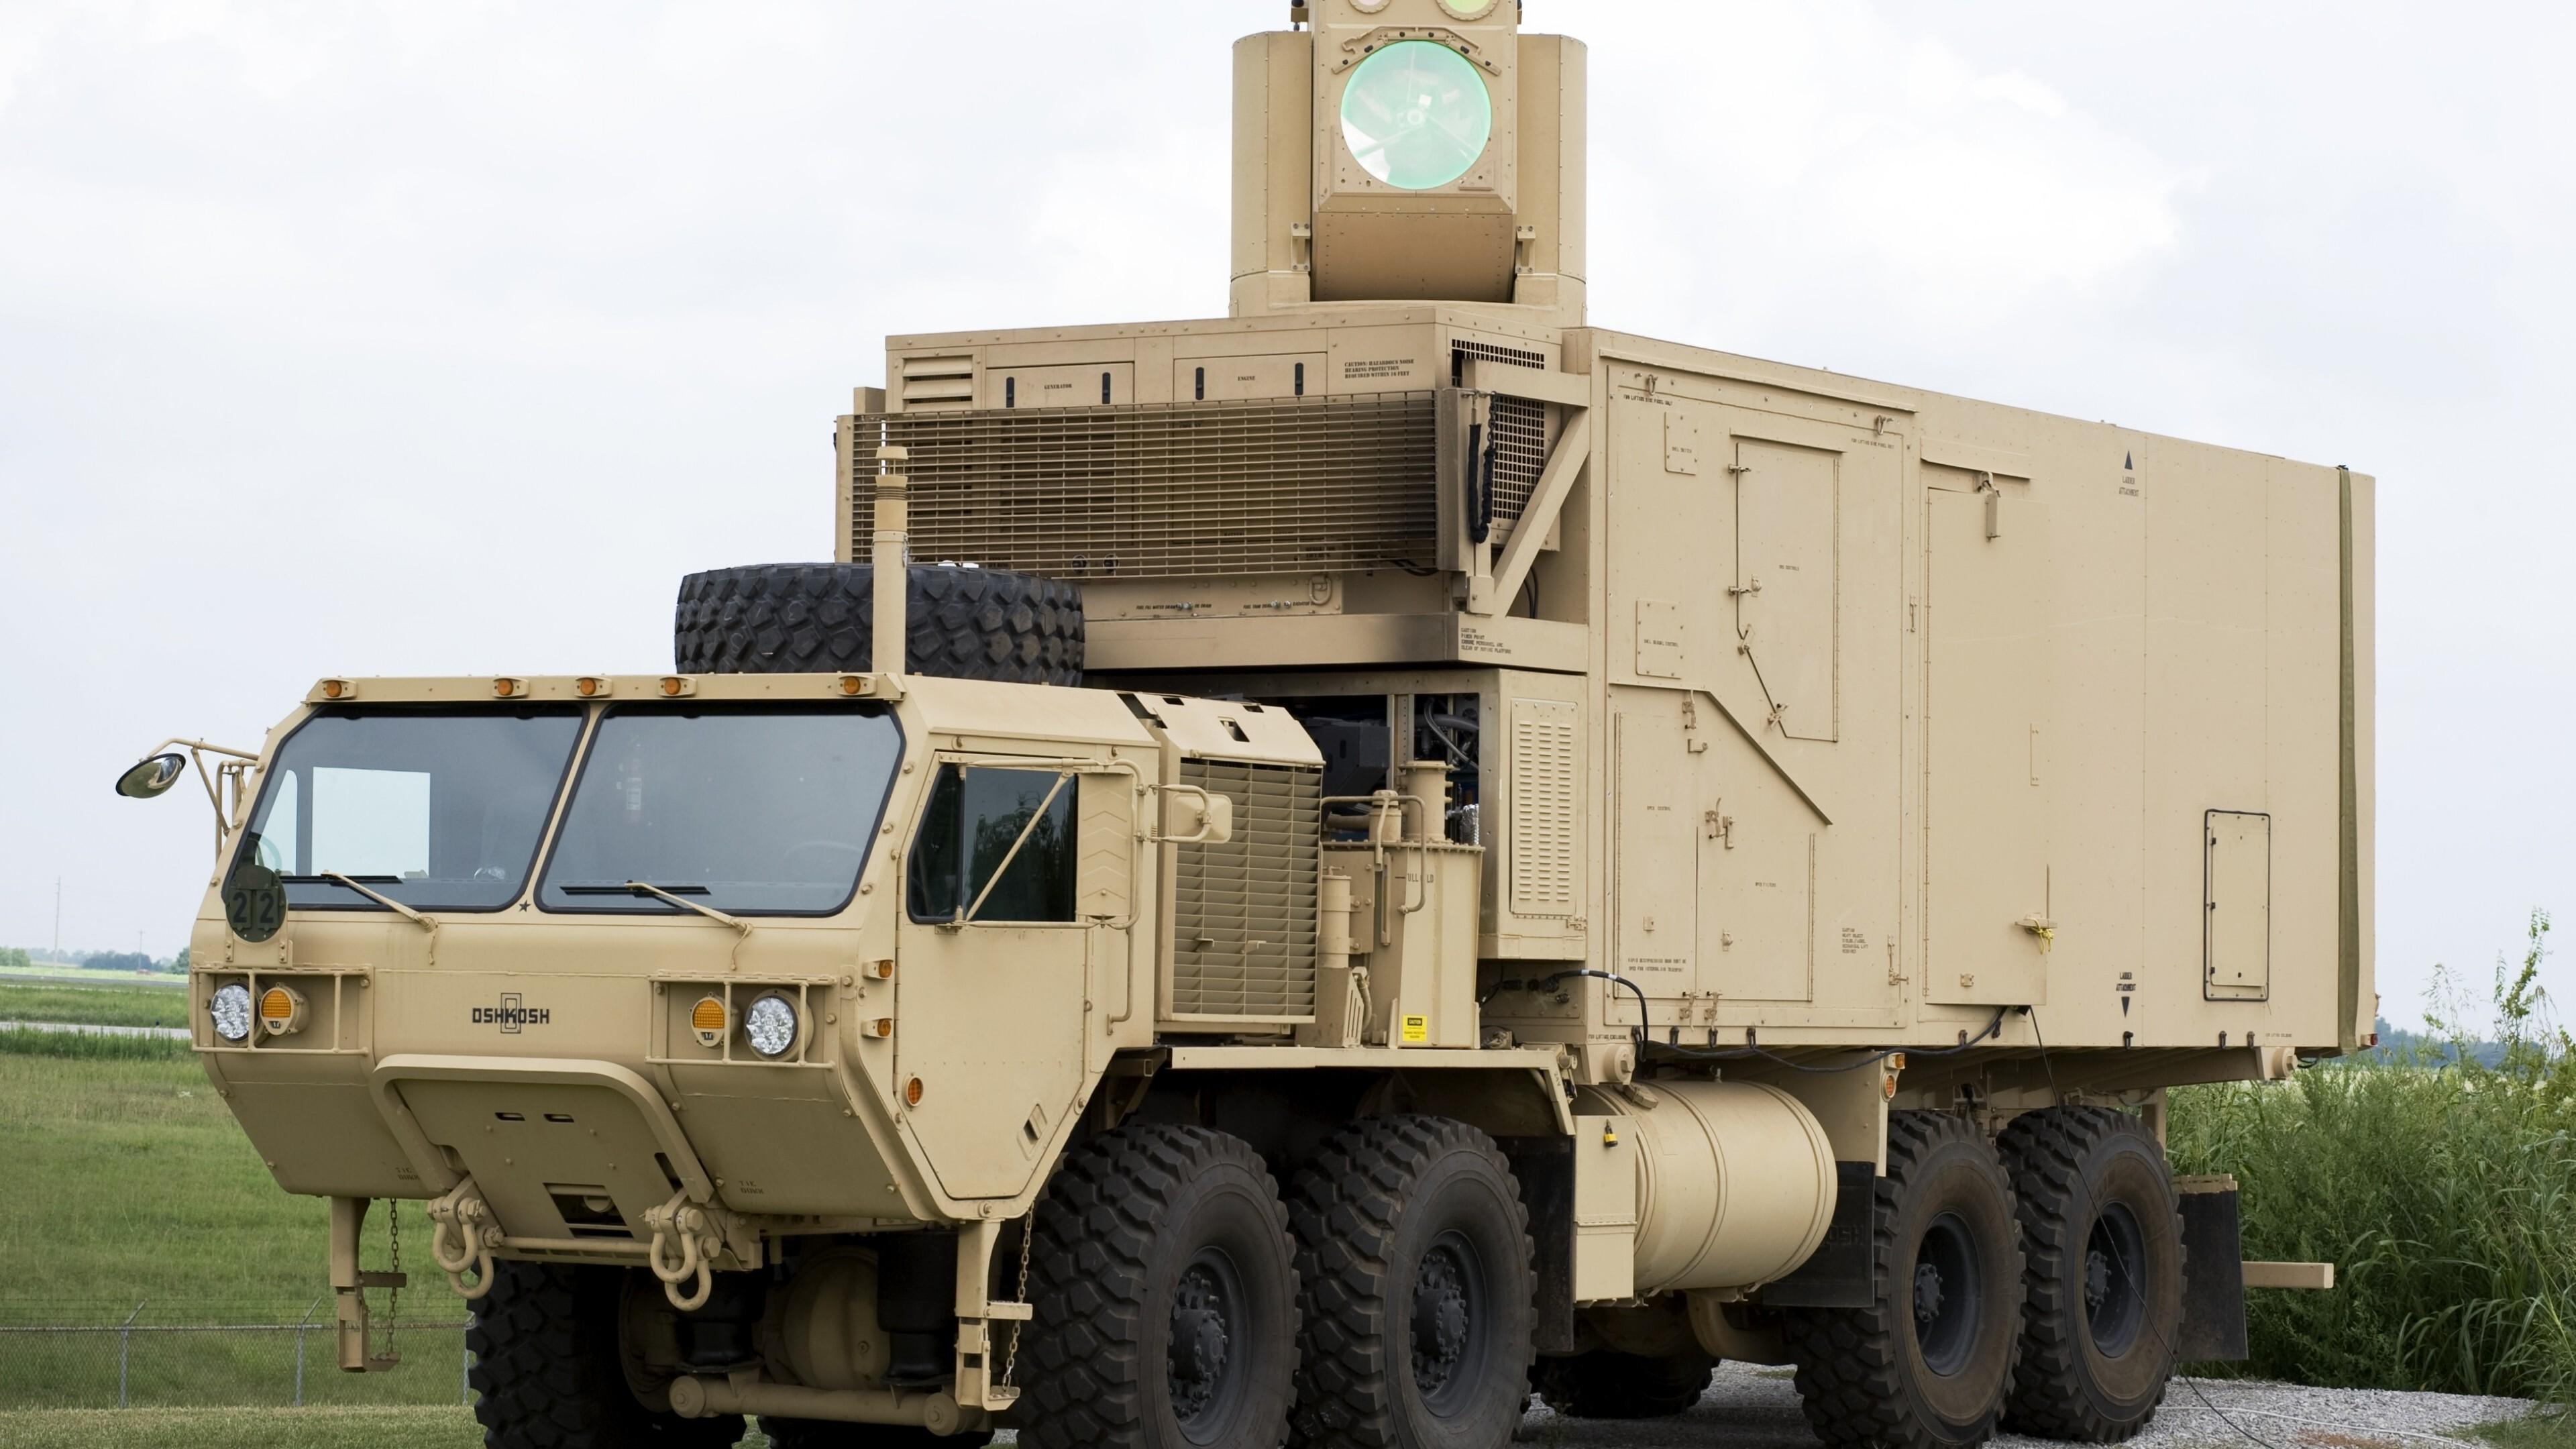 عجیب و غریبترین تسلیحات نظامی دنیا+ تصاویر